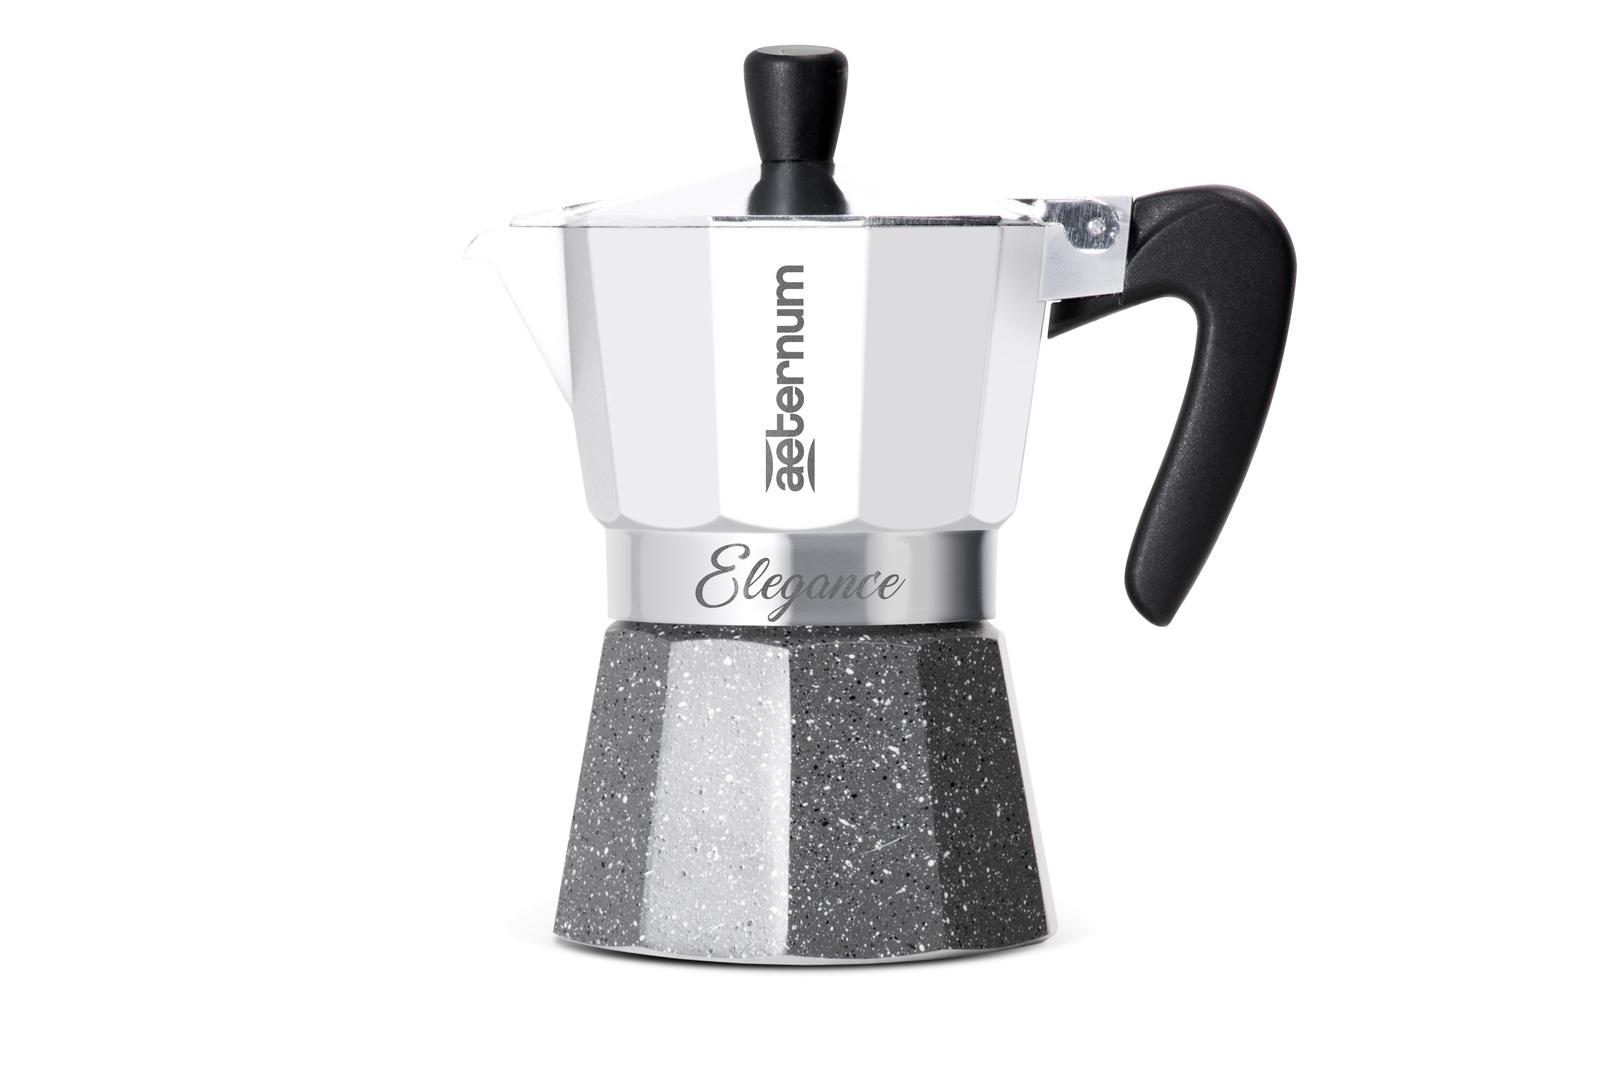 Гейзерная кофеварка Bialetti Aeternum Elegance, на 6 чашек, белый кофеварка гейзерная bialetti aeternum elegance 6 порций алюминий 6008